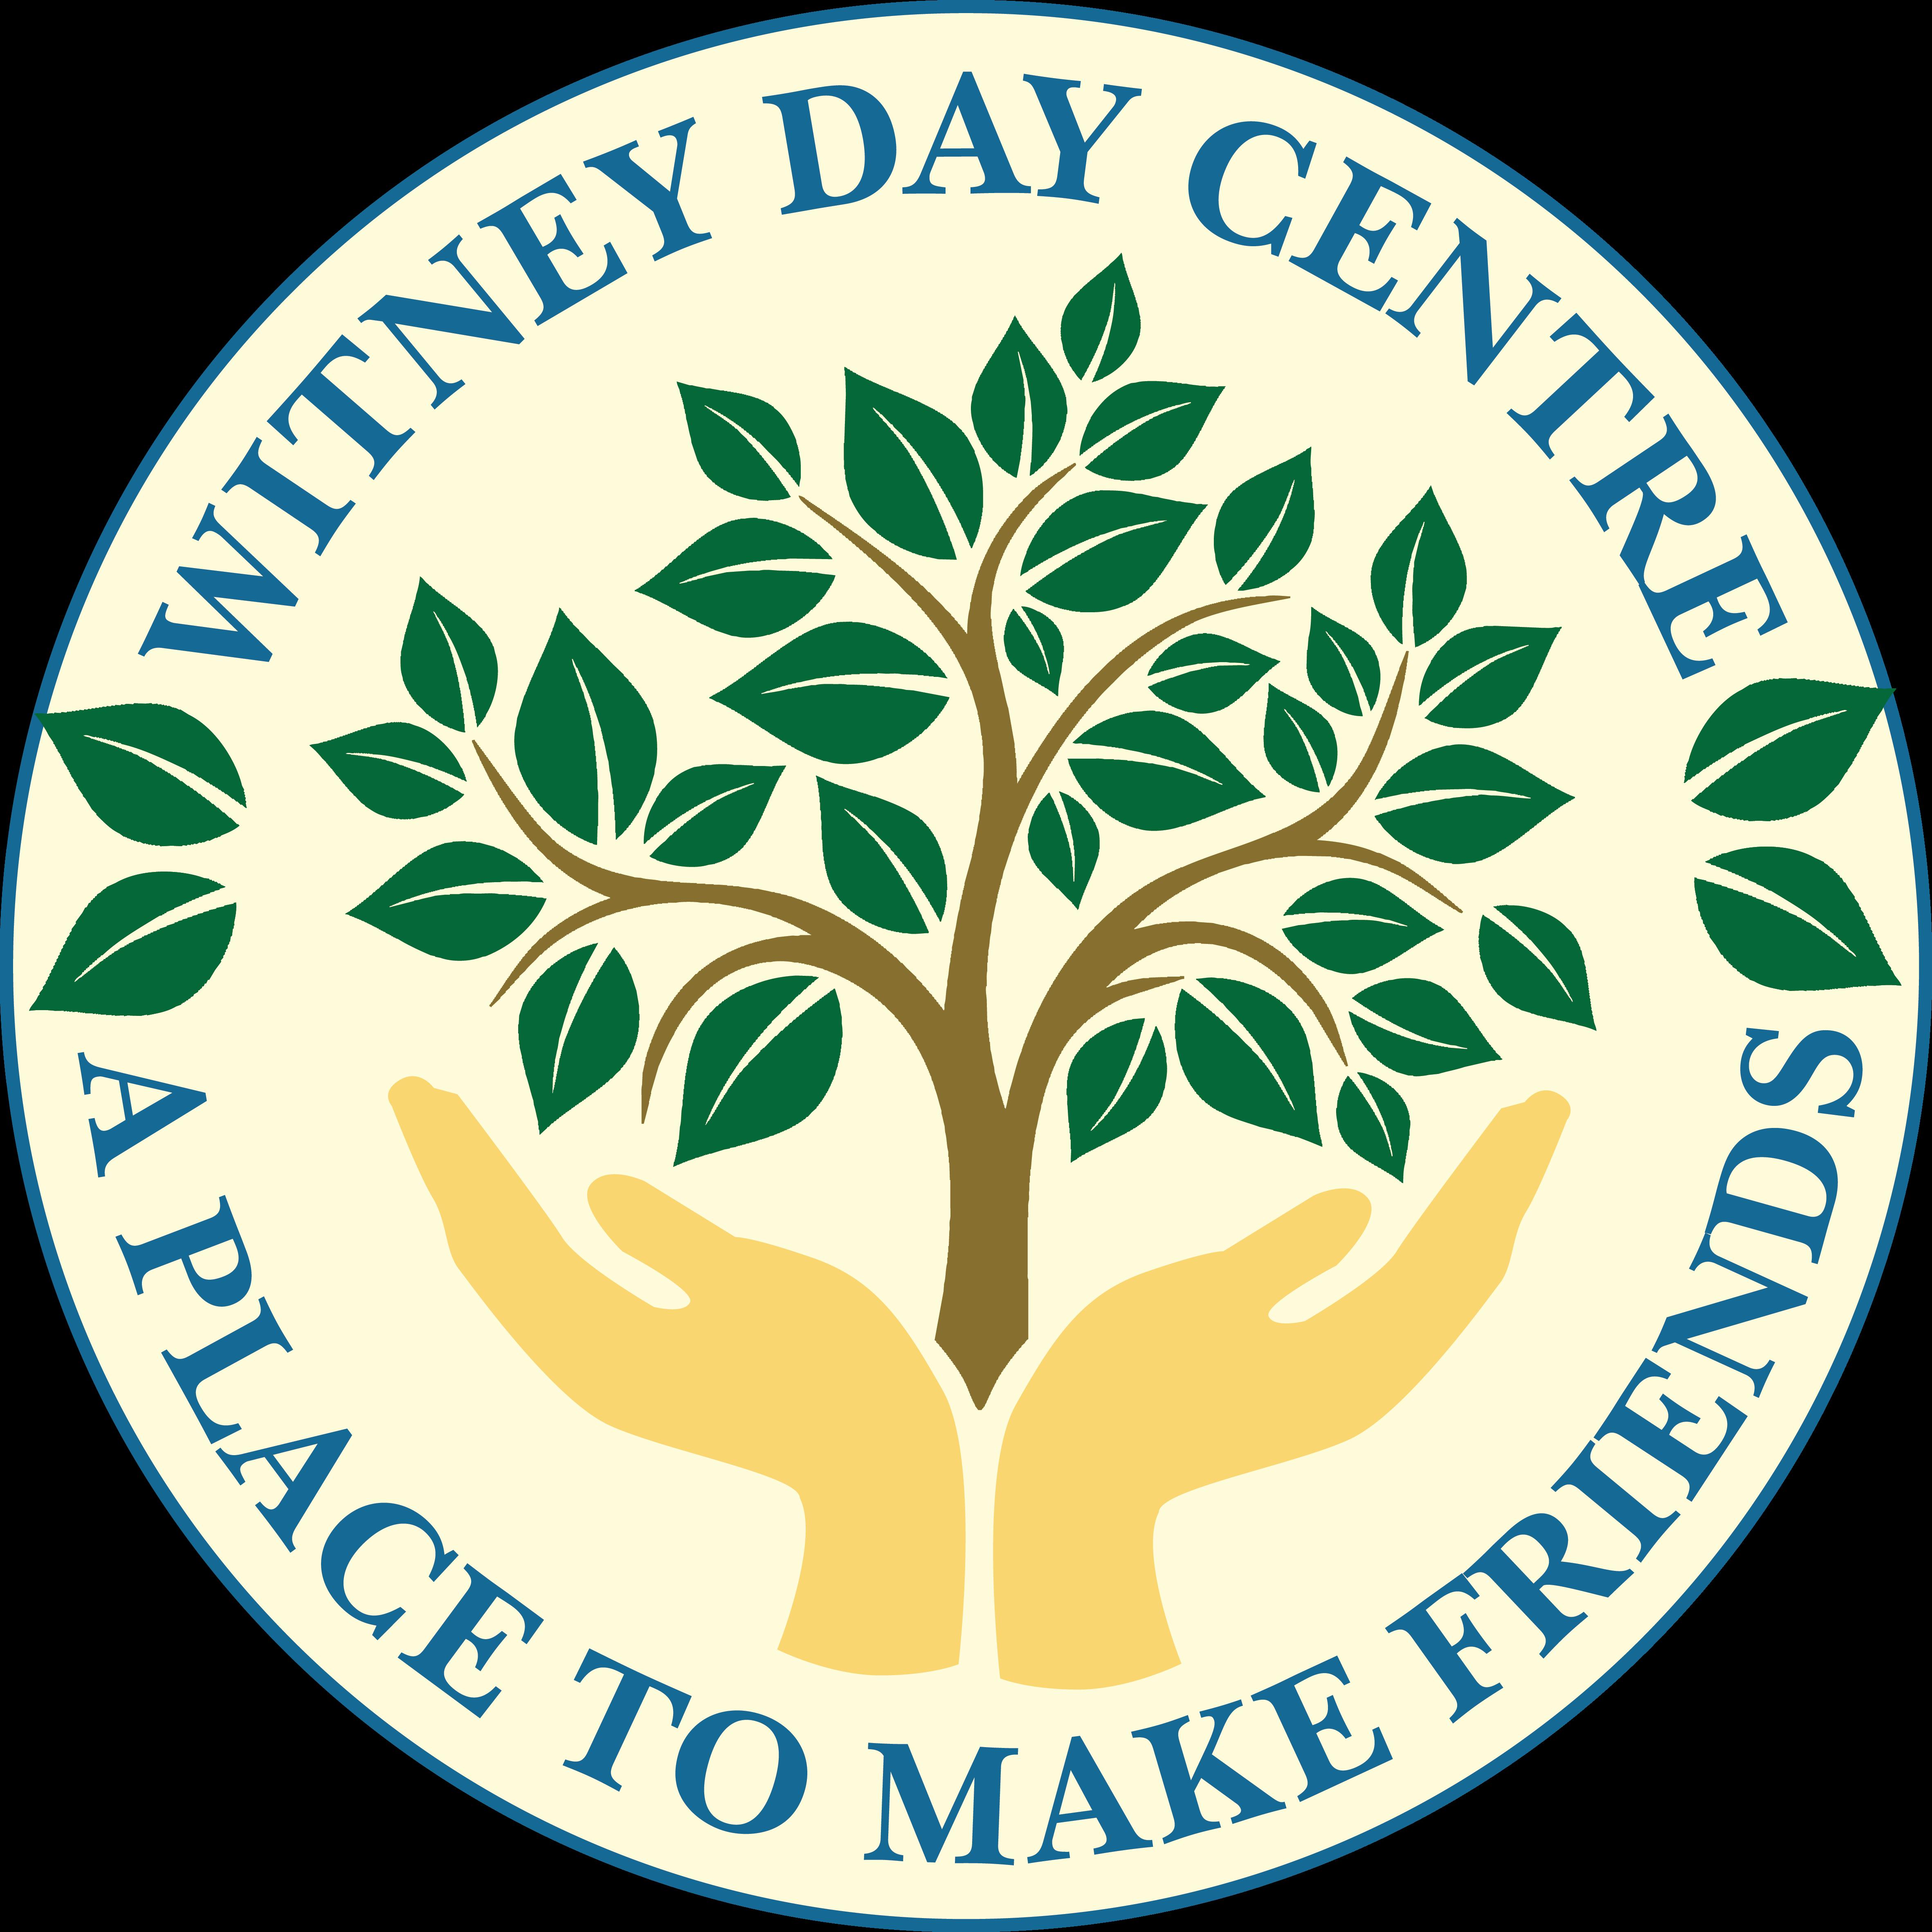 Witney Day Centre